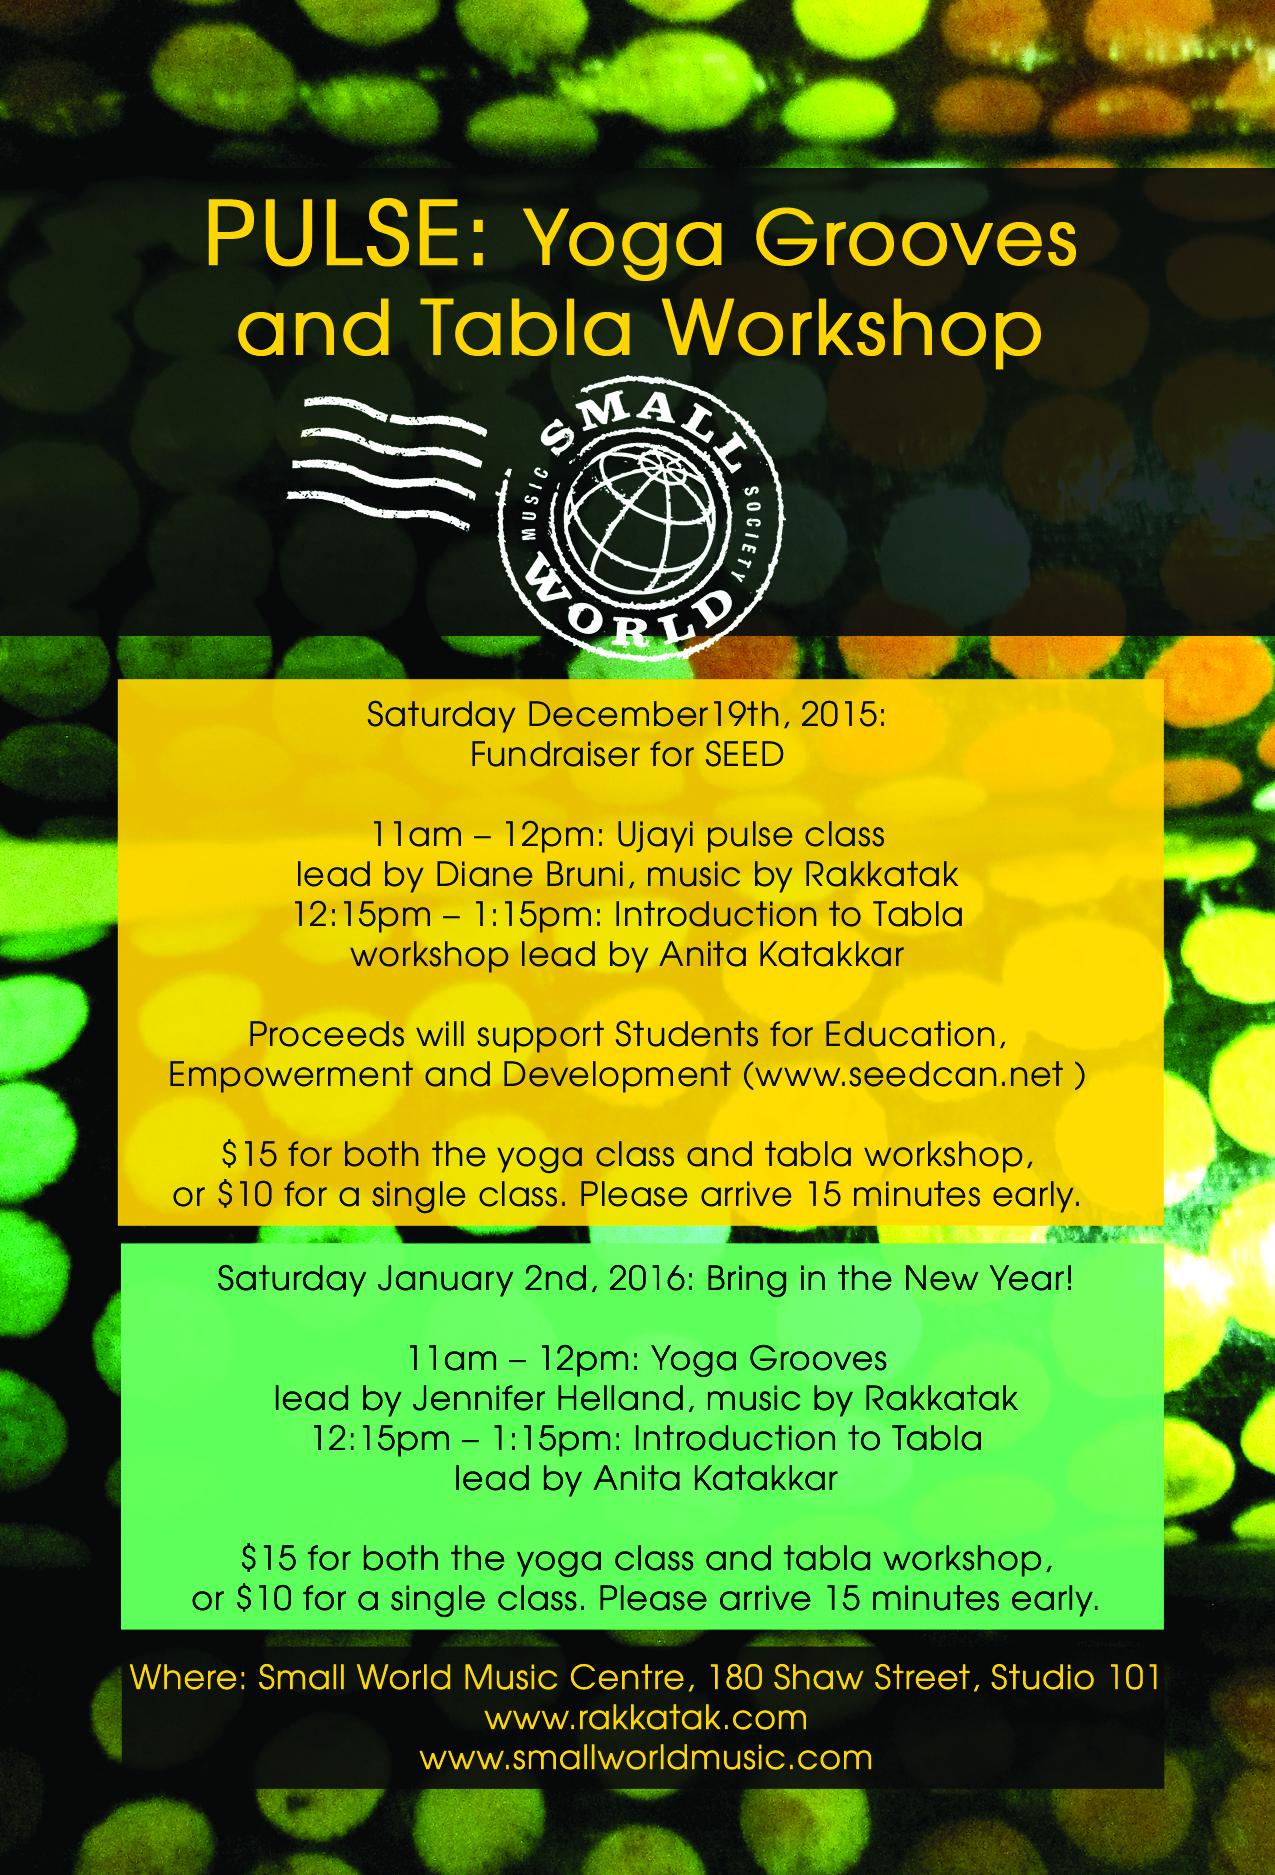 yogatablaworkshop_smallworld_flyer_v12 copy